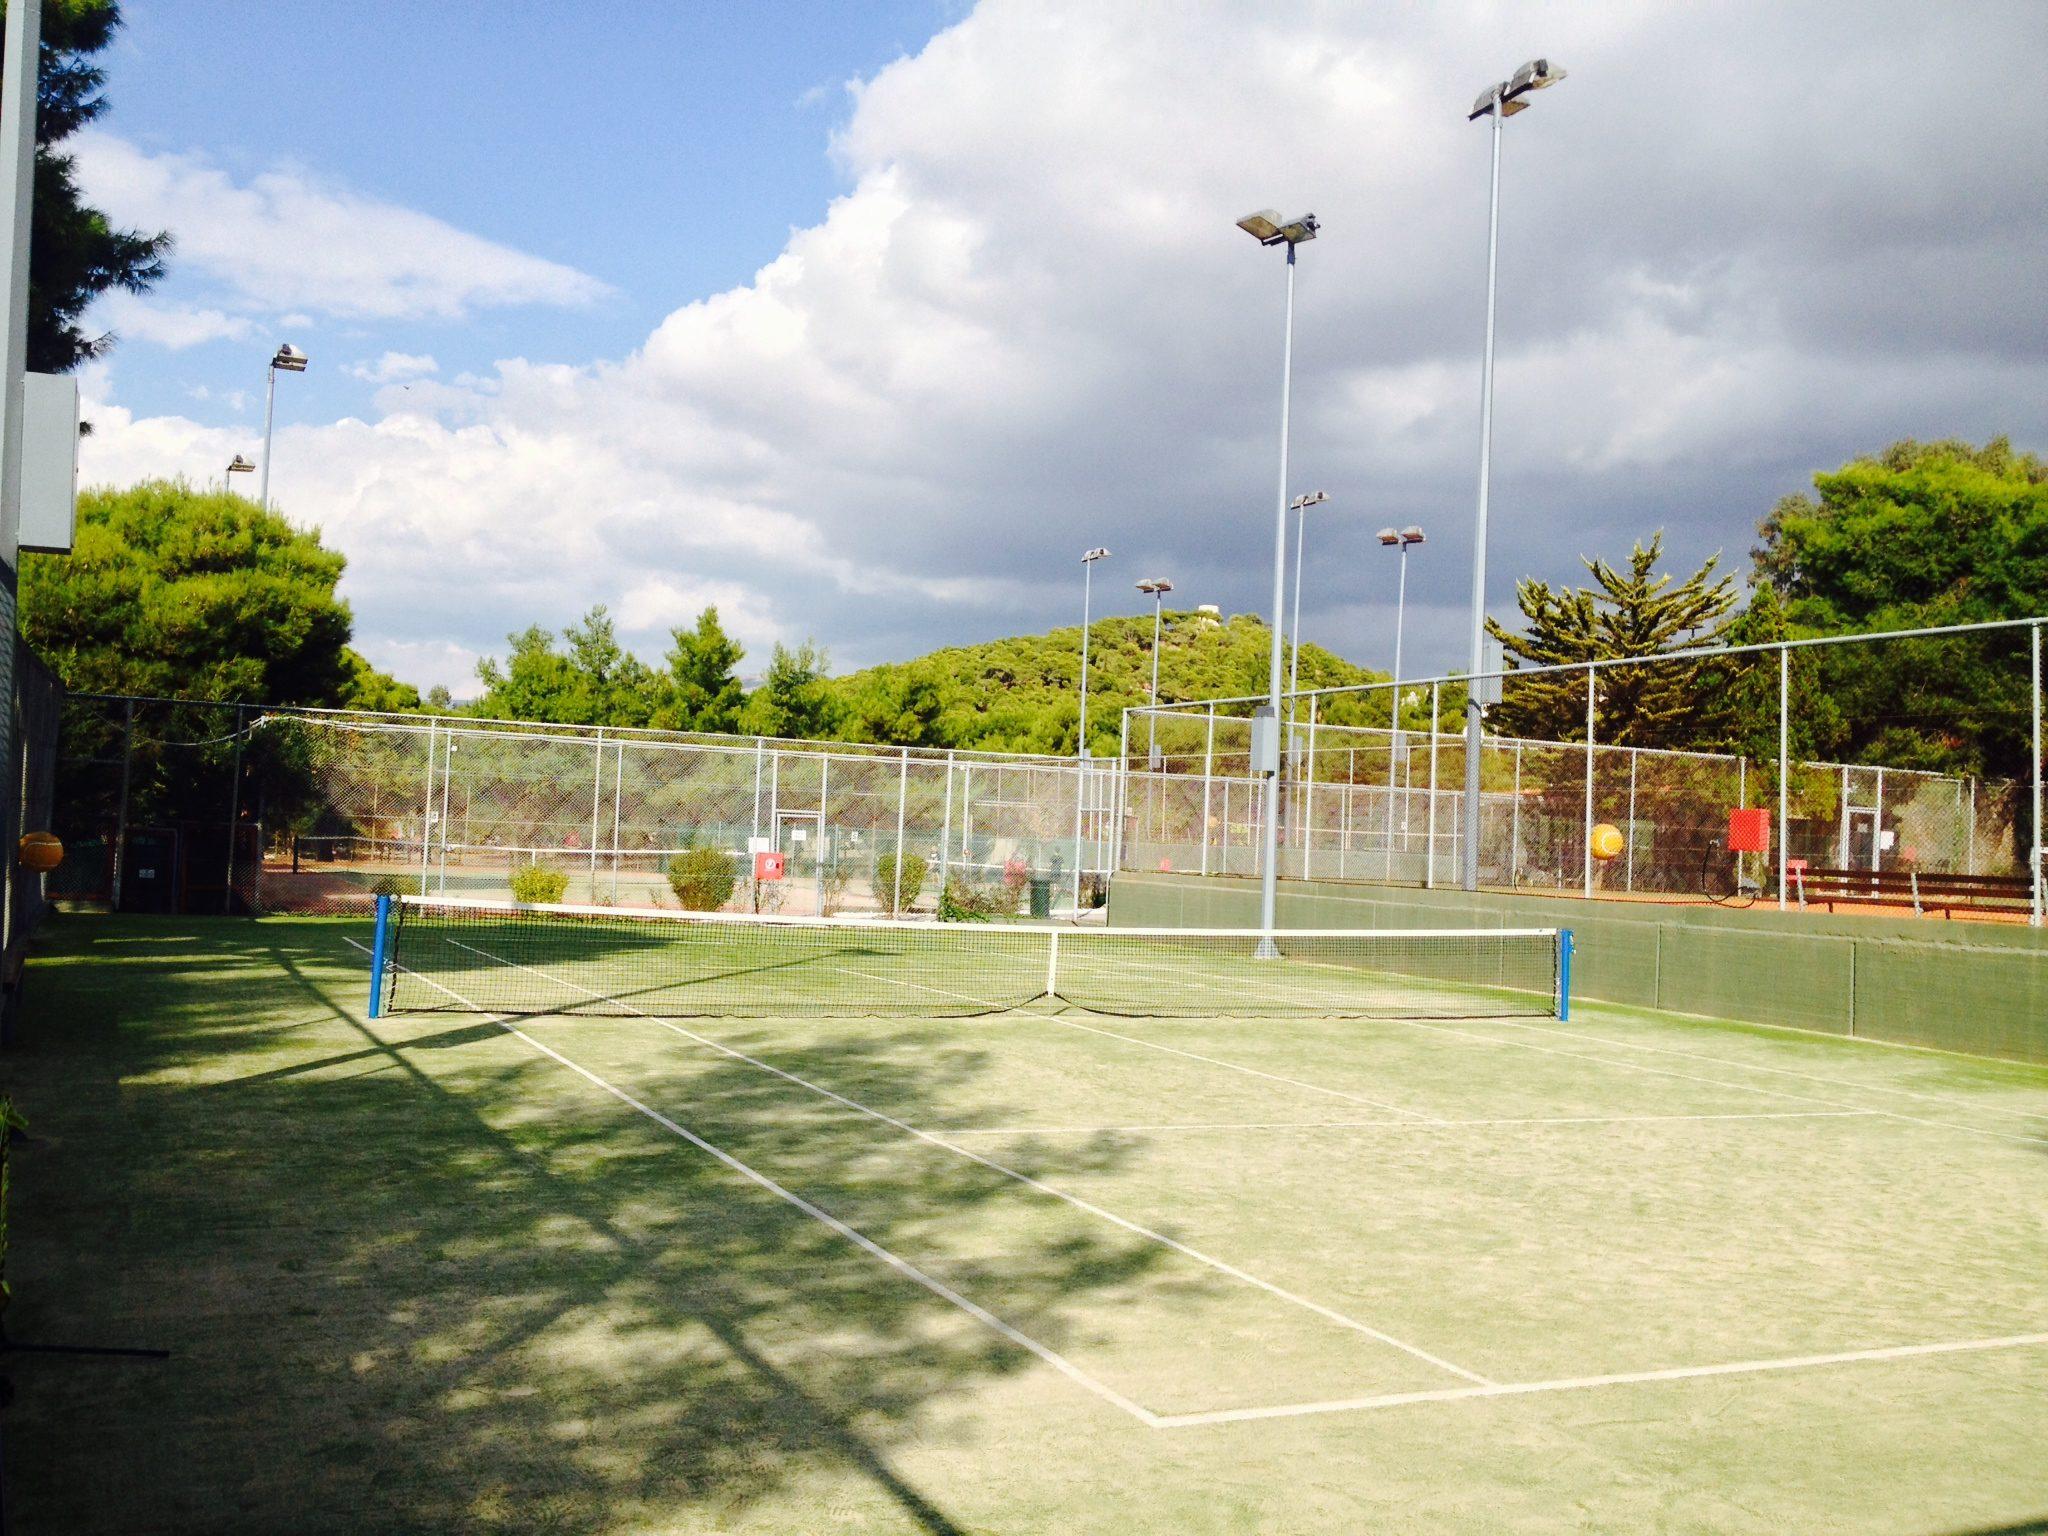 kavouri tennis club court grass